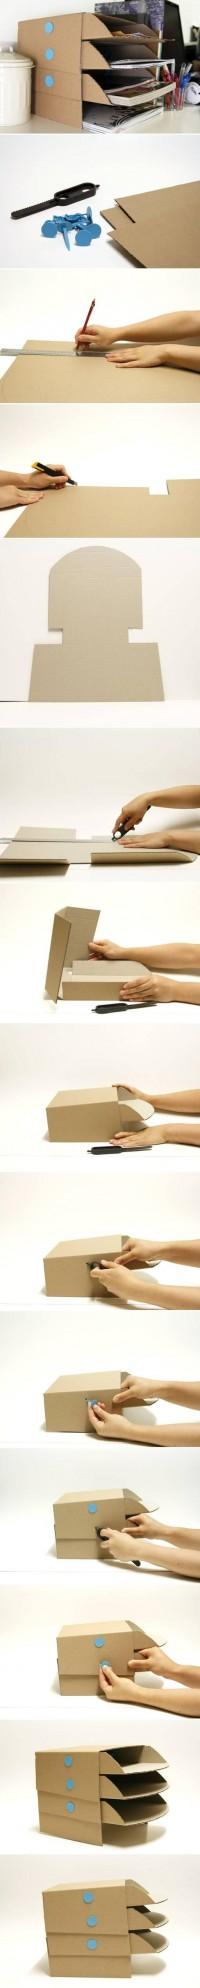 DIY Cardboard Desk Tray DIY Projects | UsefulDIY.com